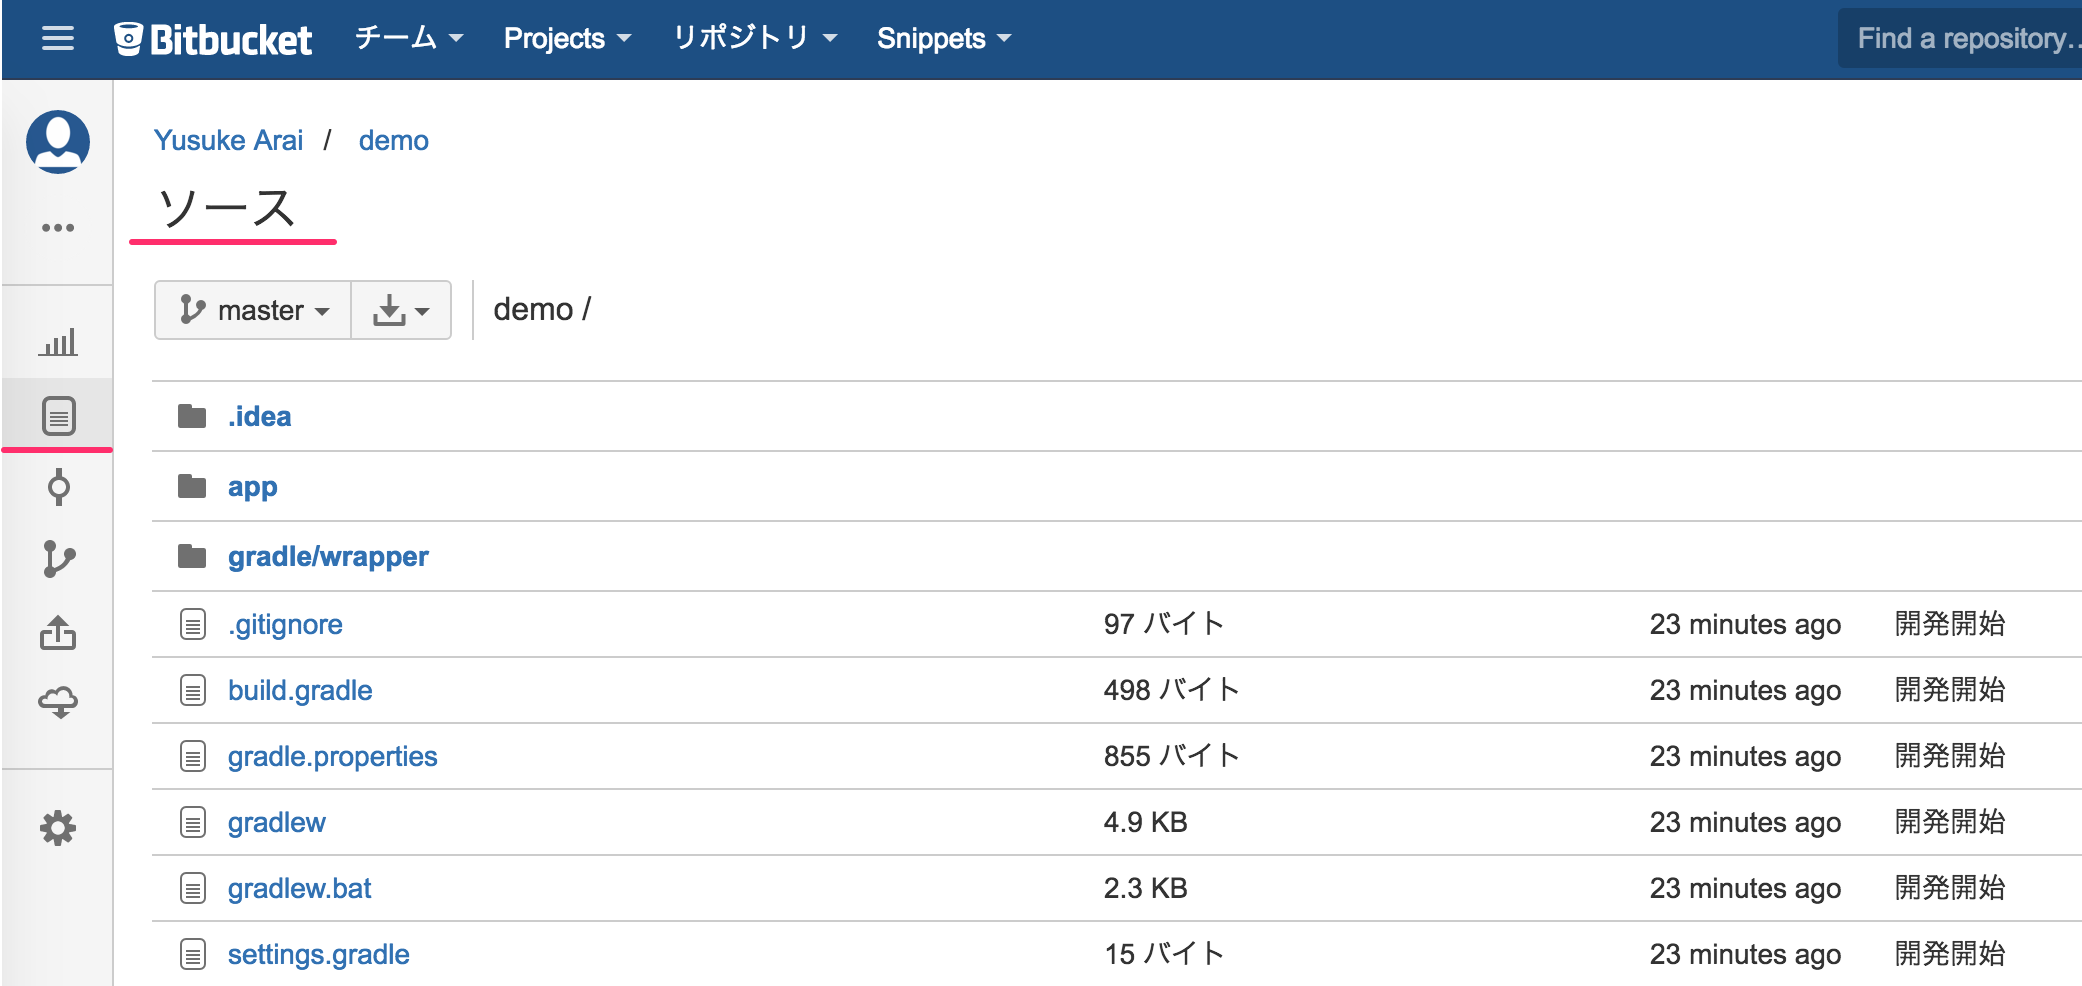 araiyusuke___demo___ソース___—_Bitbucket.png